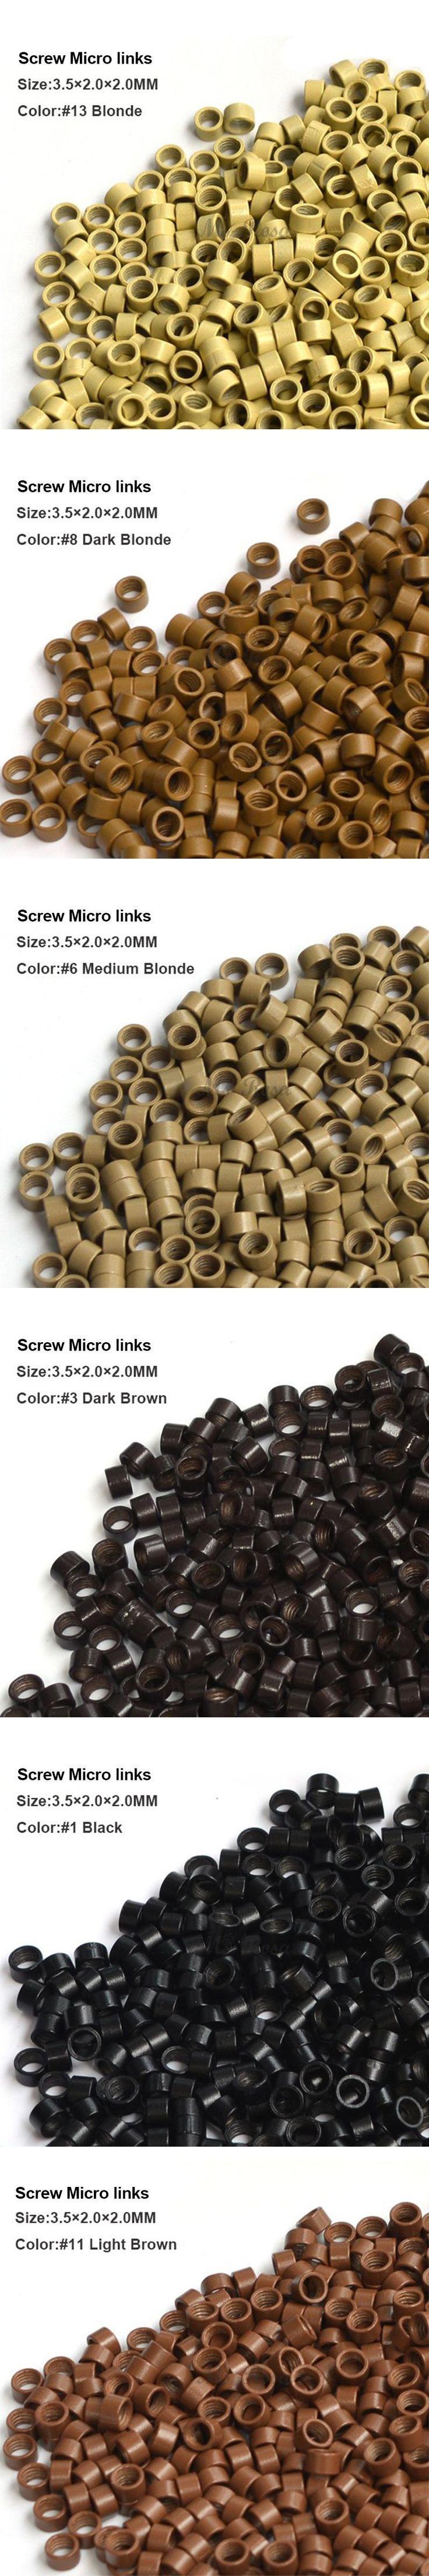 Screw Micro Rings 3.5*2.0*2.0MM 1000Pcs/Bottle #6 Medium Blonde Micro Ring Hair Extension Tools Micro Links Hair Extension